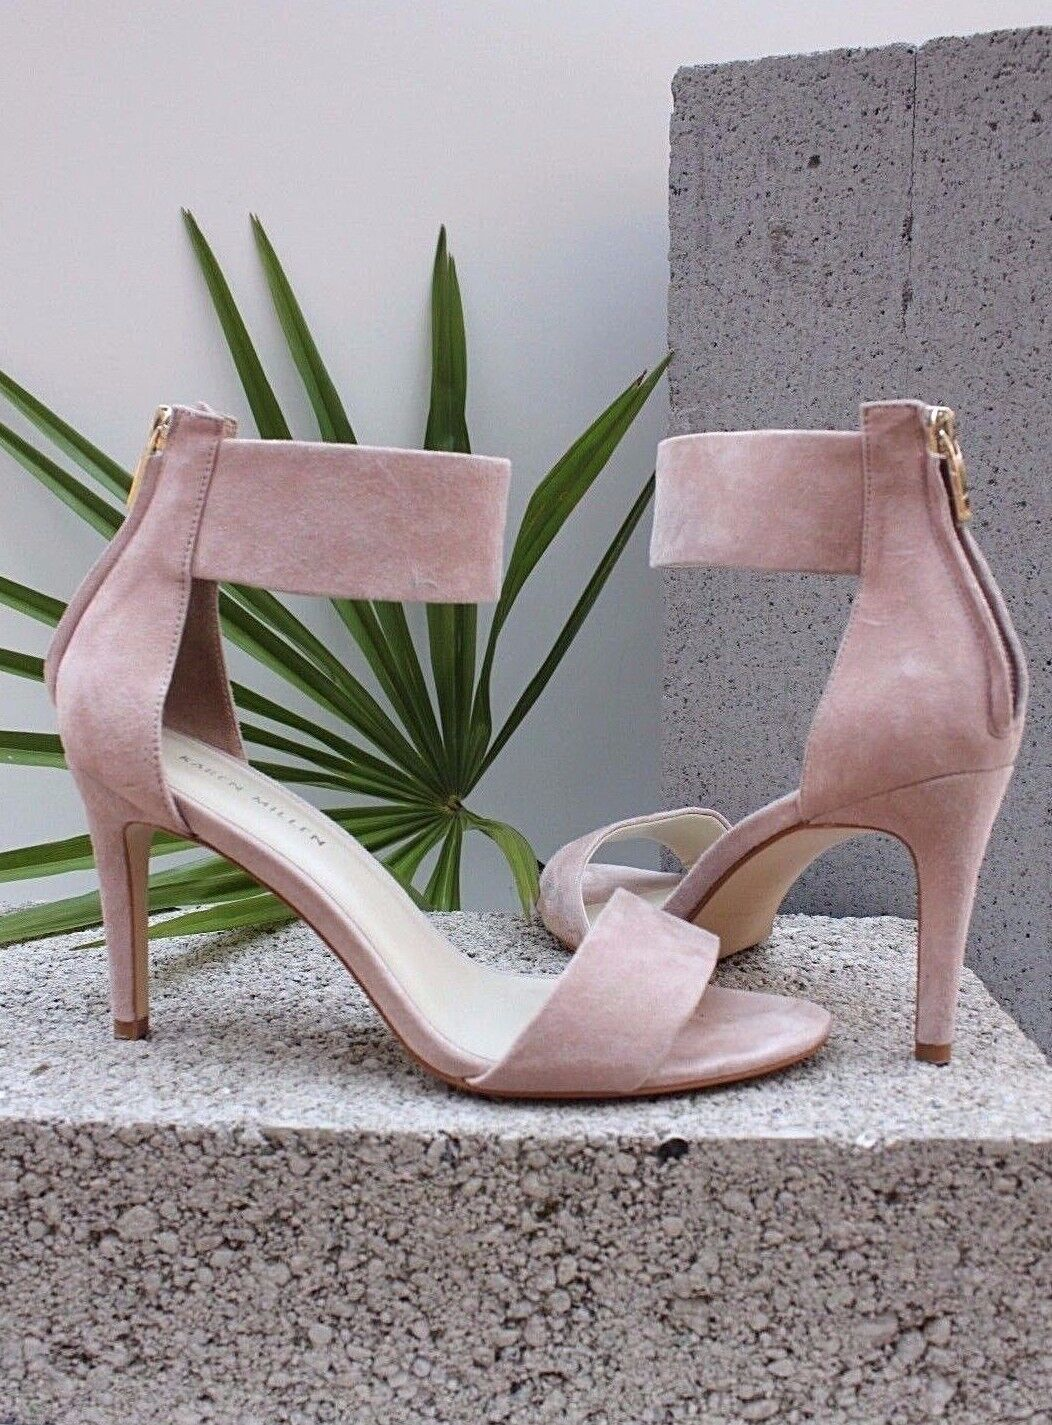 Karen Millen FY095 desnuda Tacones Zapatos Stiletto Sandalias De Cuero De Gamuza 3 36